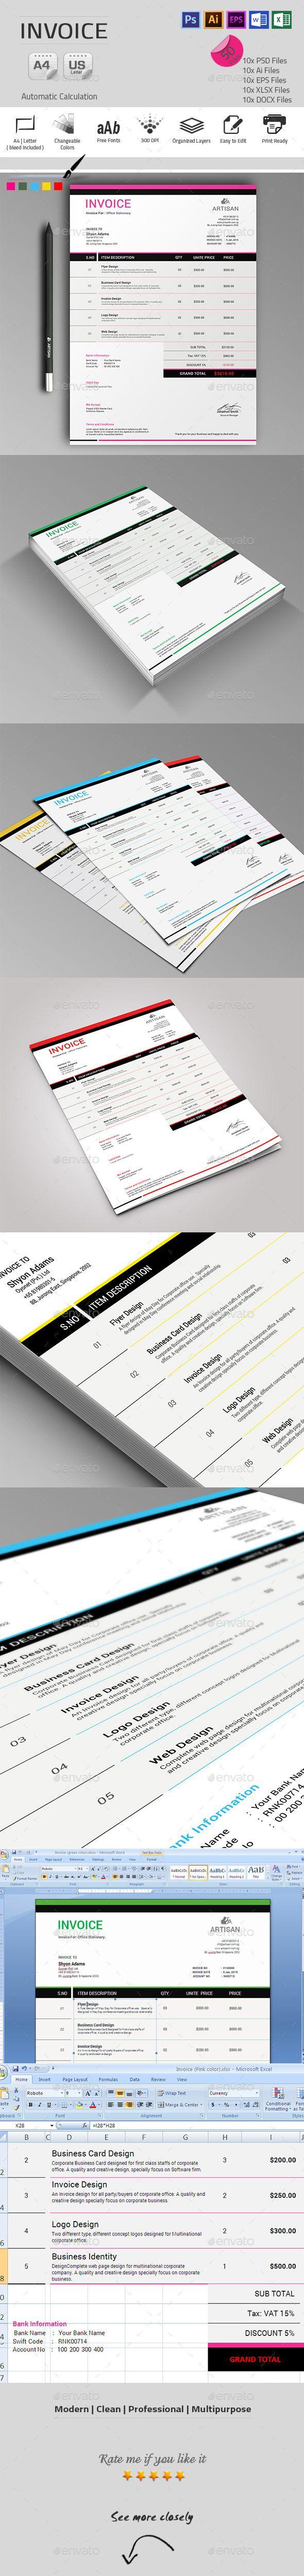 24 best Design: Invoices images on Pinterest | Invoice design ...